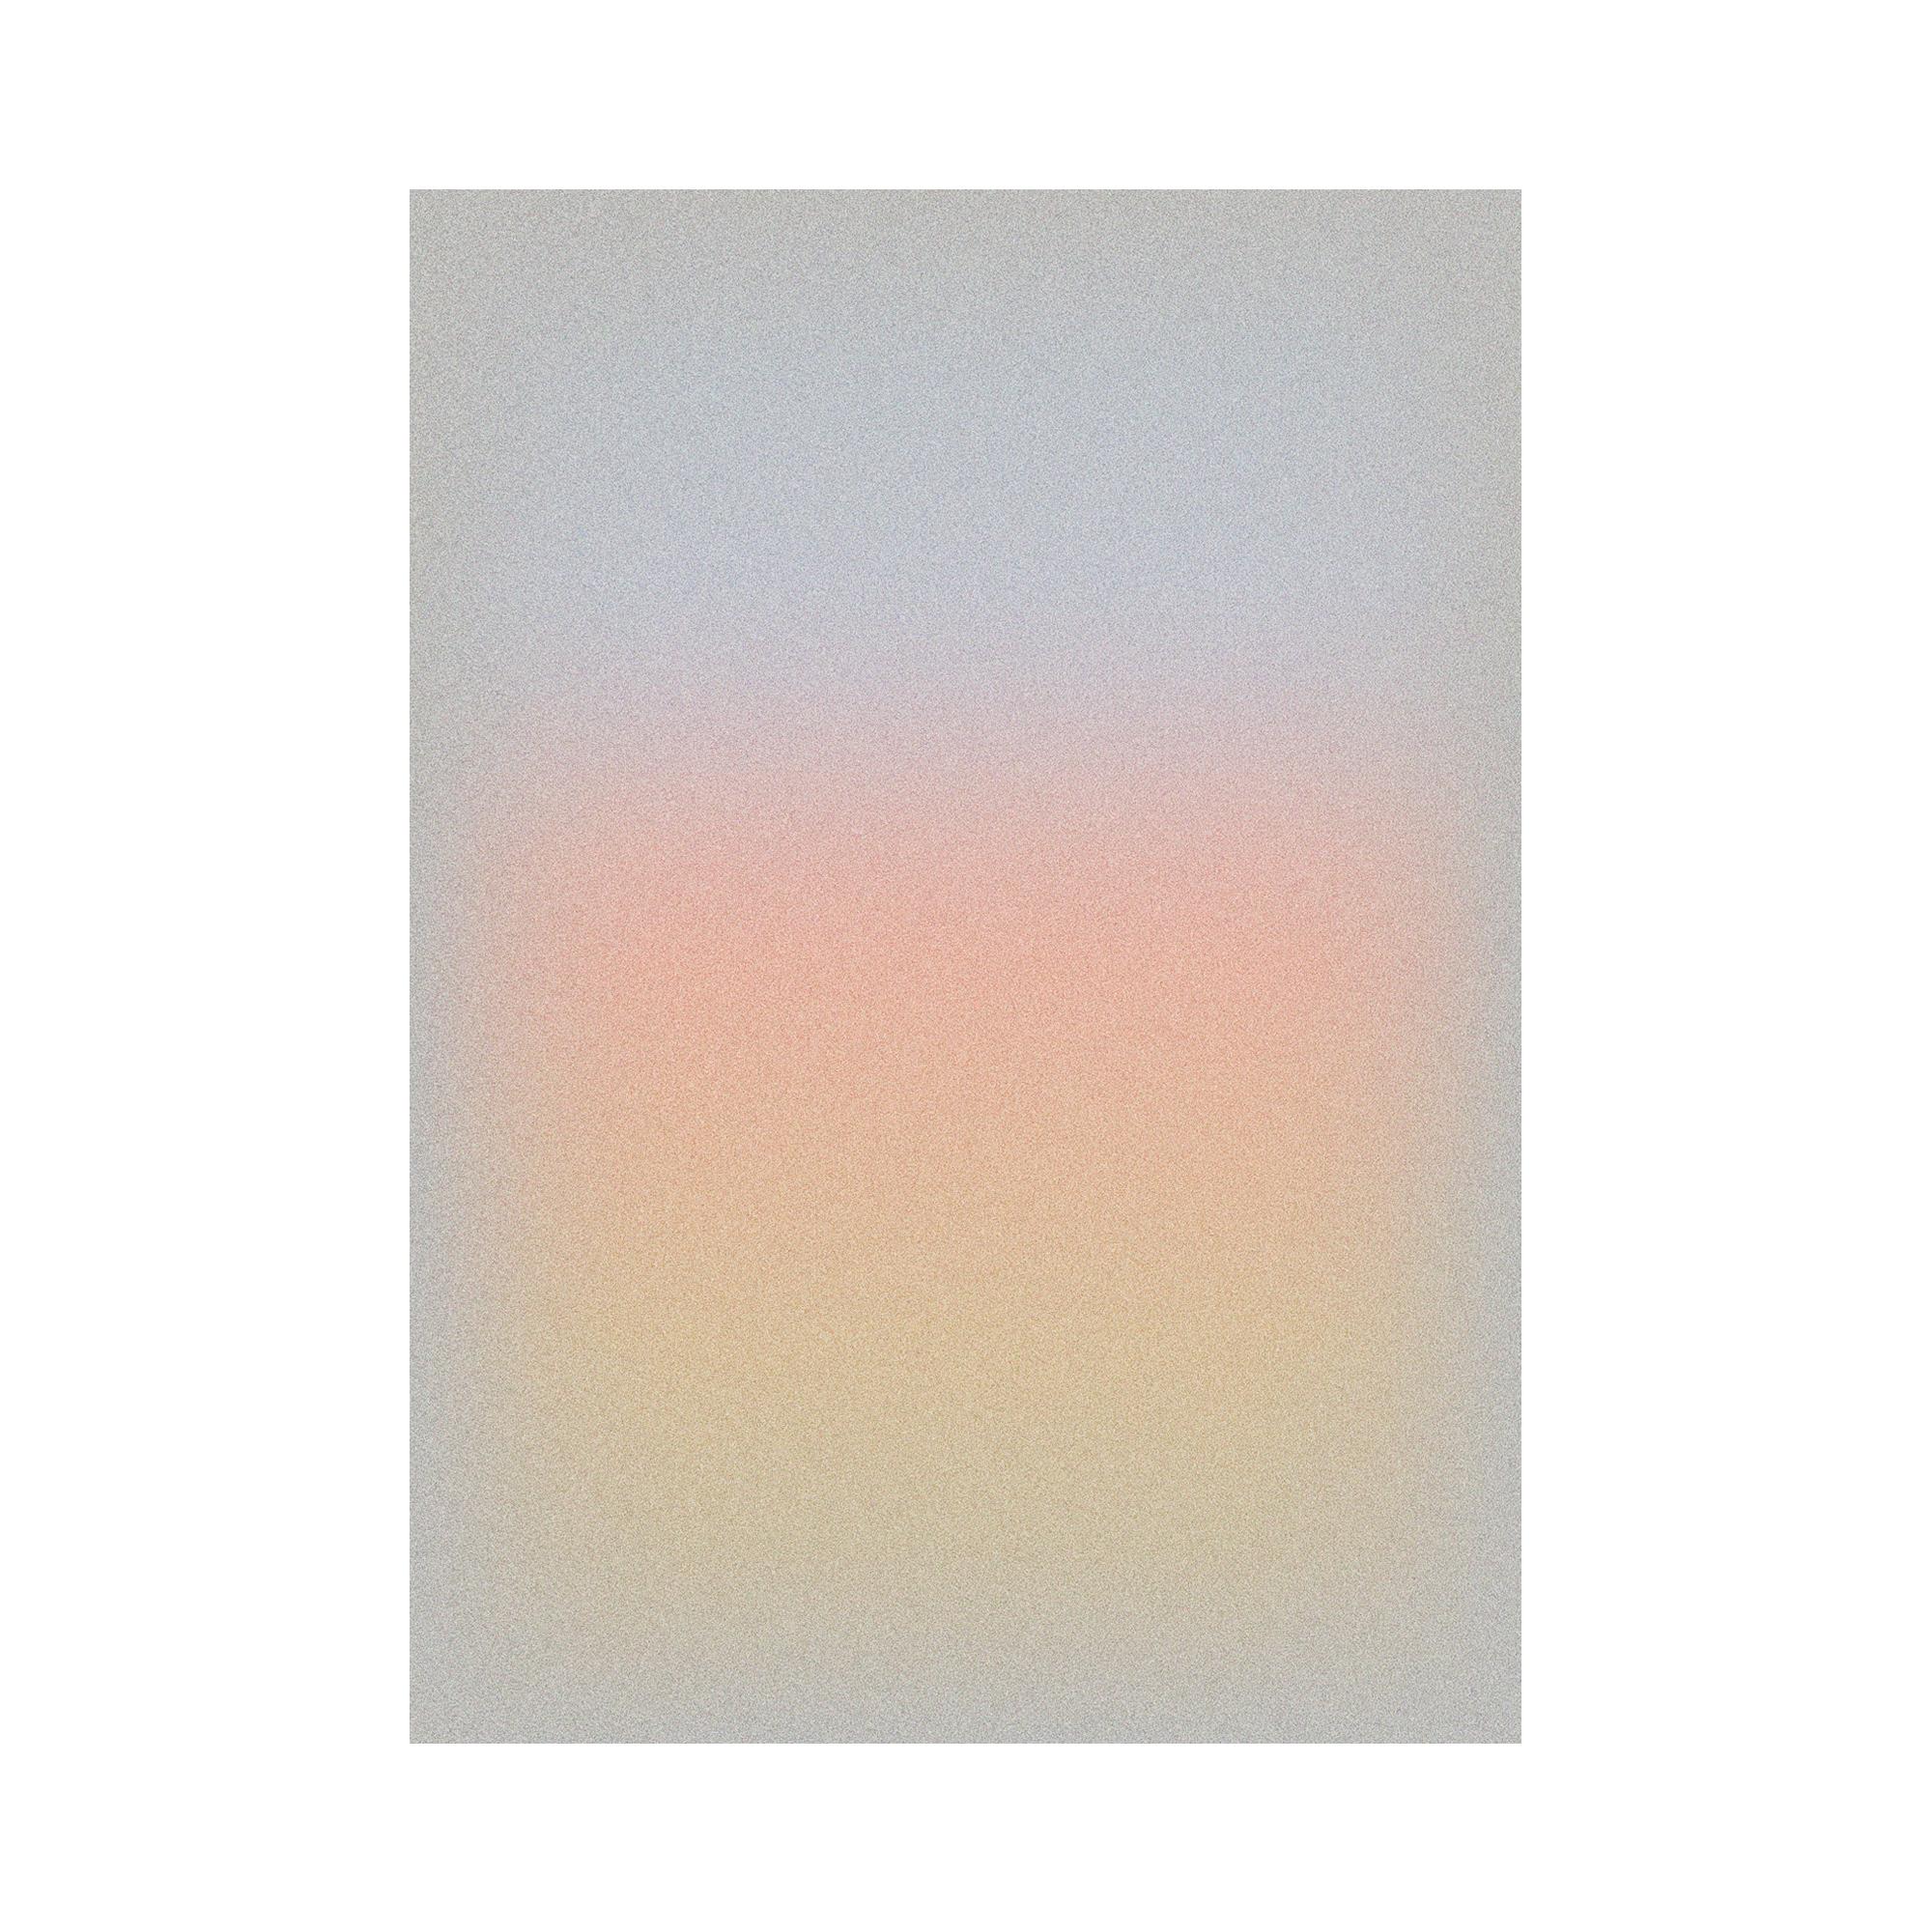 ruxandraduru_color_transl_1.jpg